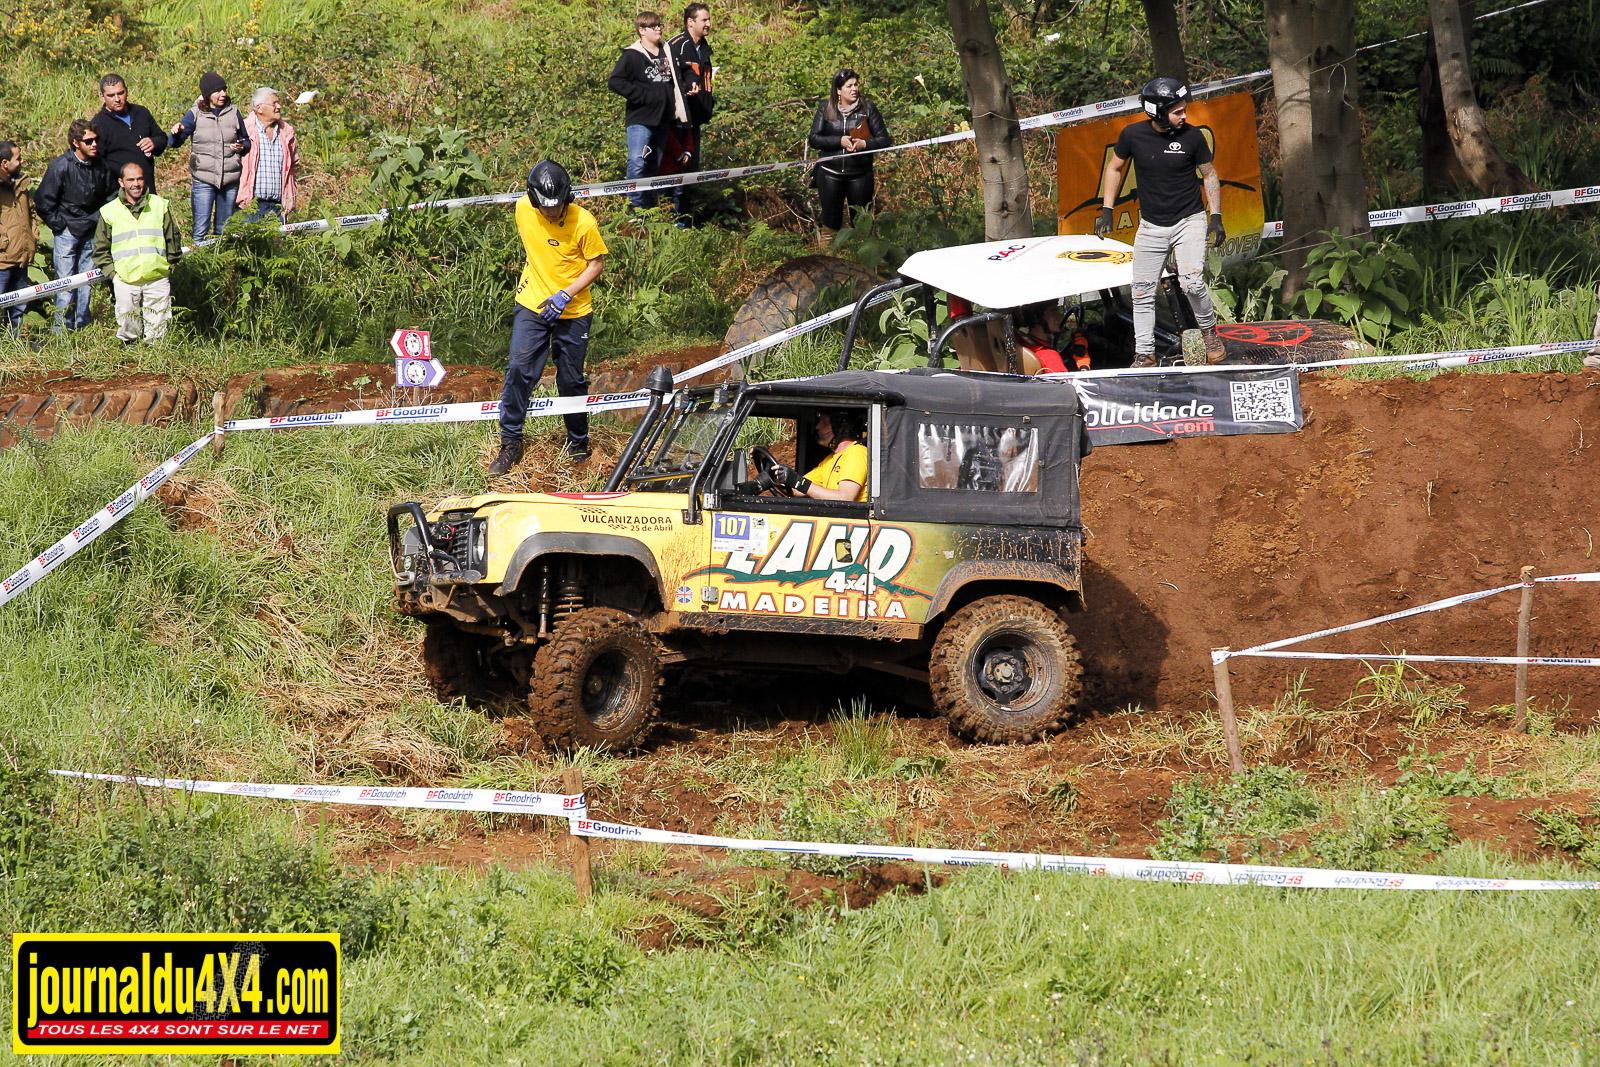 Land 4x4 Madeira - 2nd place 'Promoção' Class